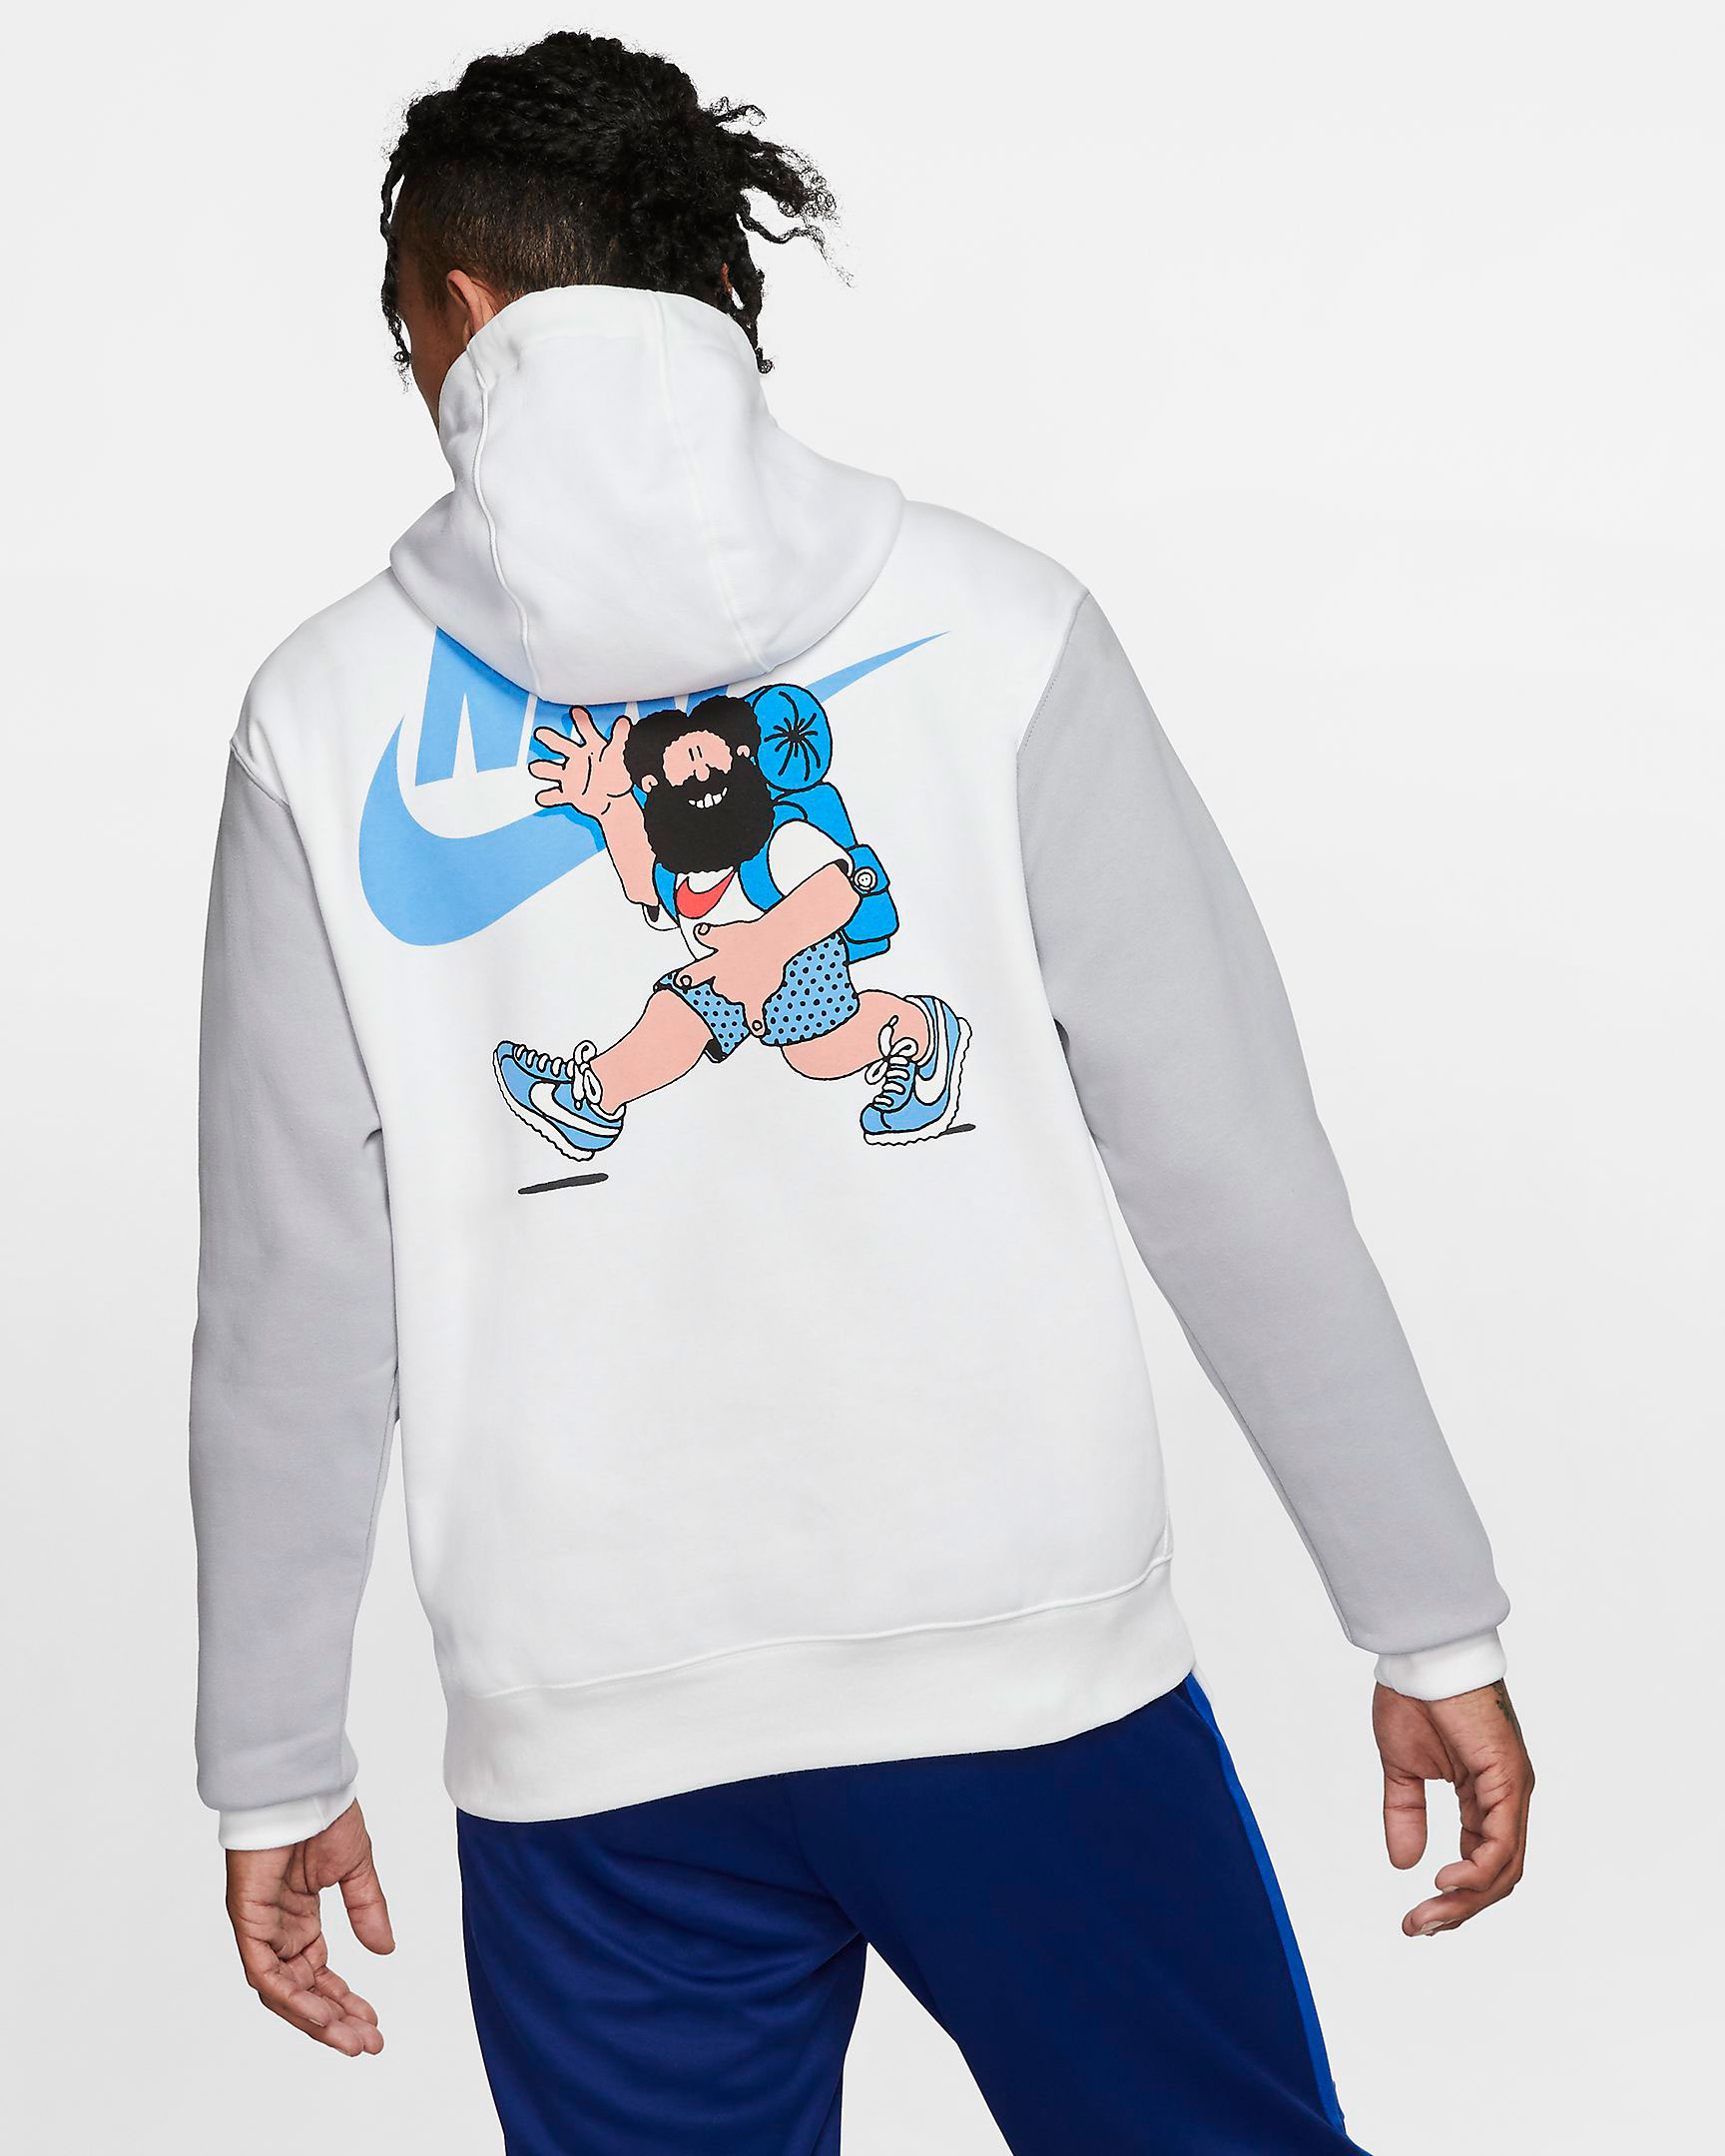 nike-hike-man-hoodie-white-grey-2